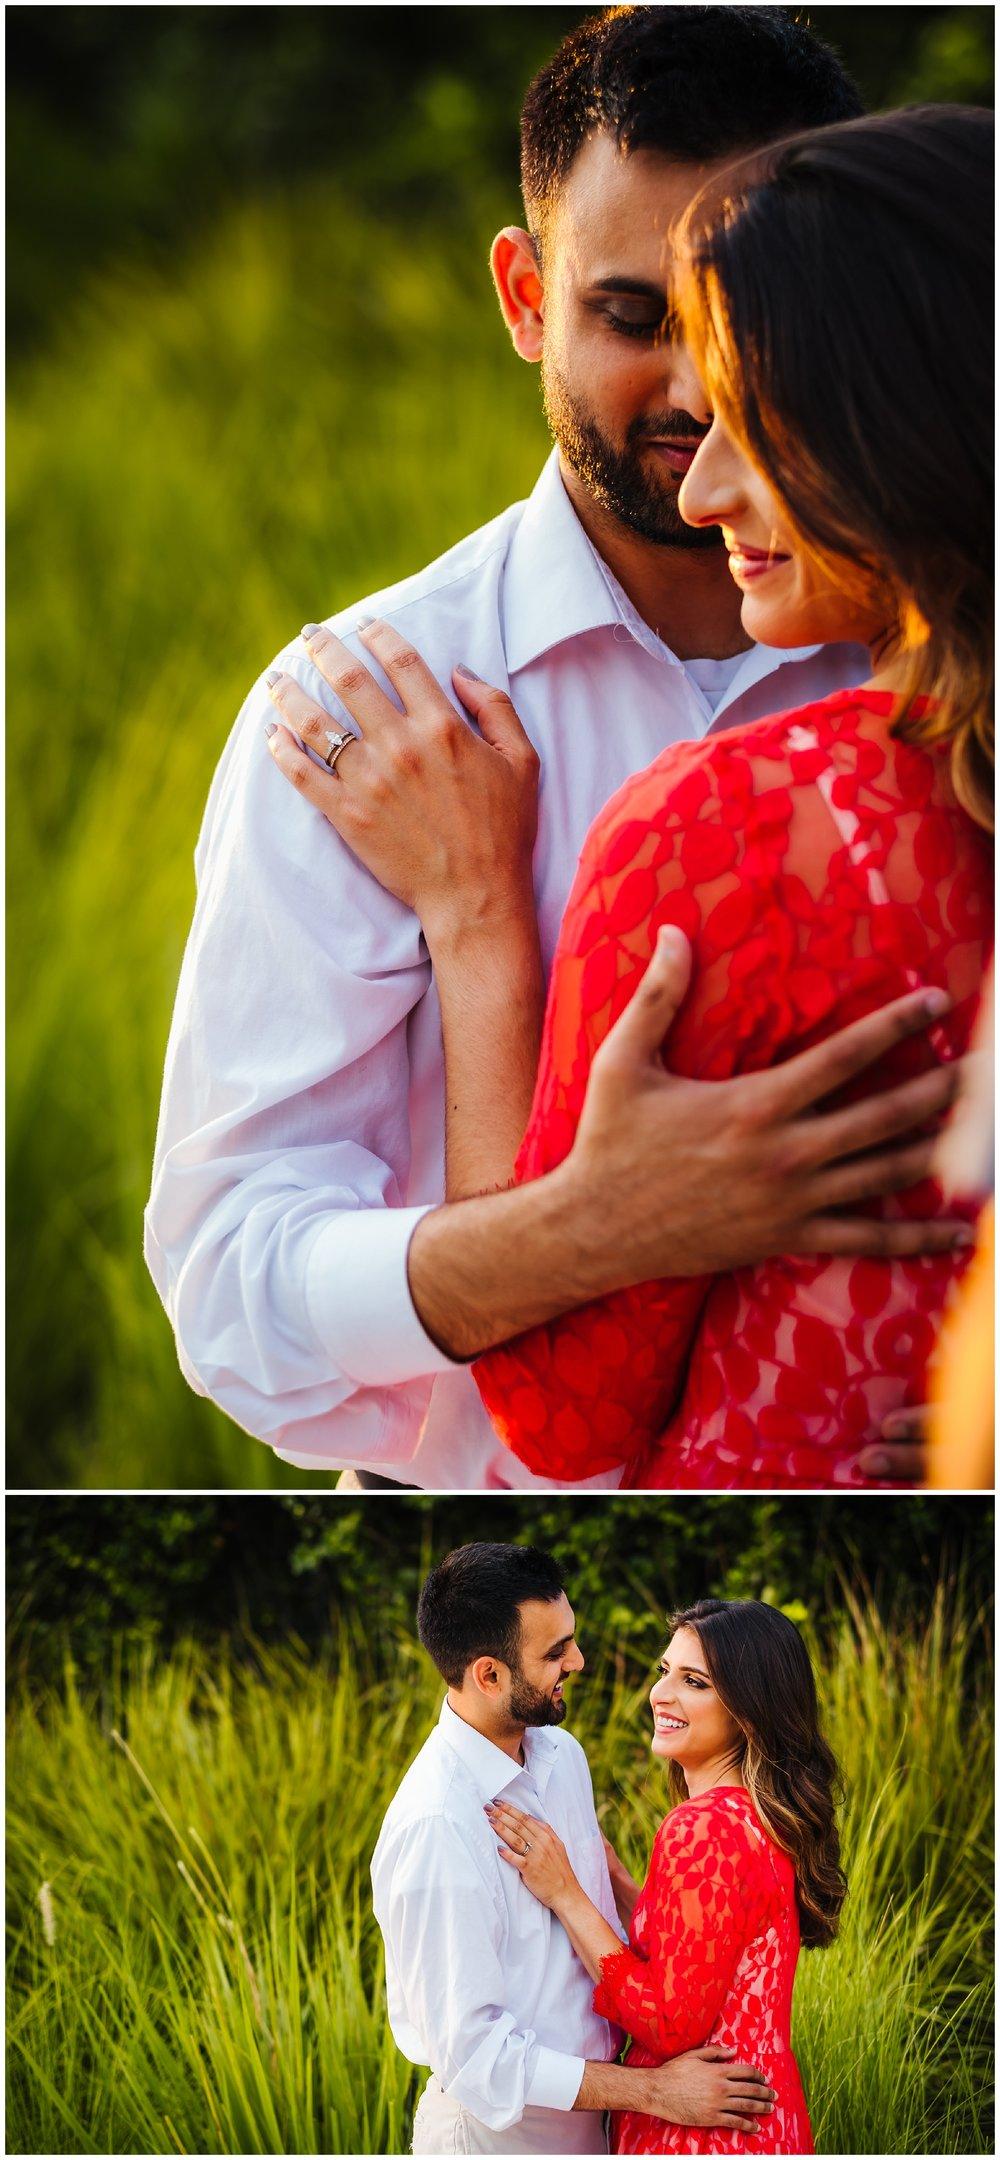 -tampa-st-pete-wedding-portrait-studio-photographer-colorful-vibrant-creative_0108.jpg